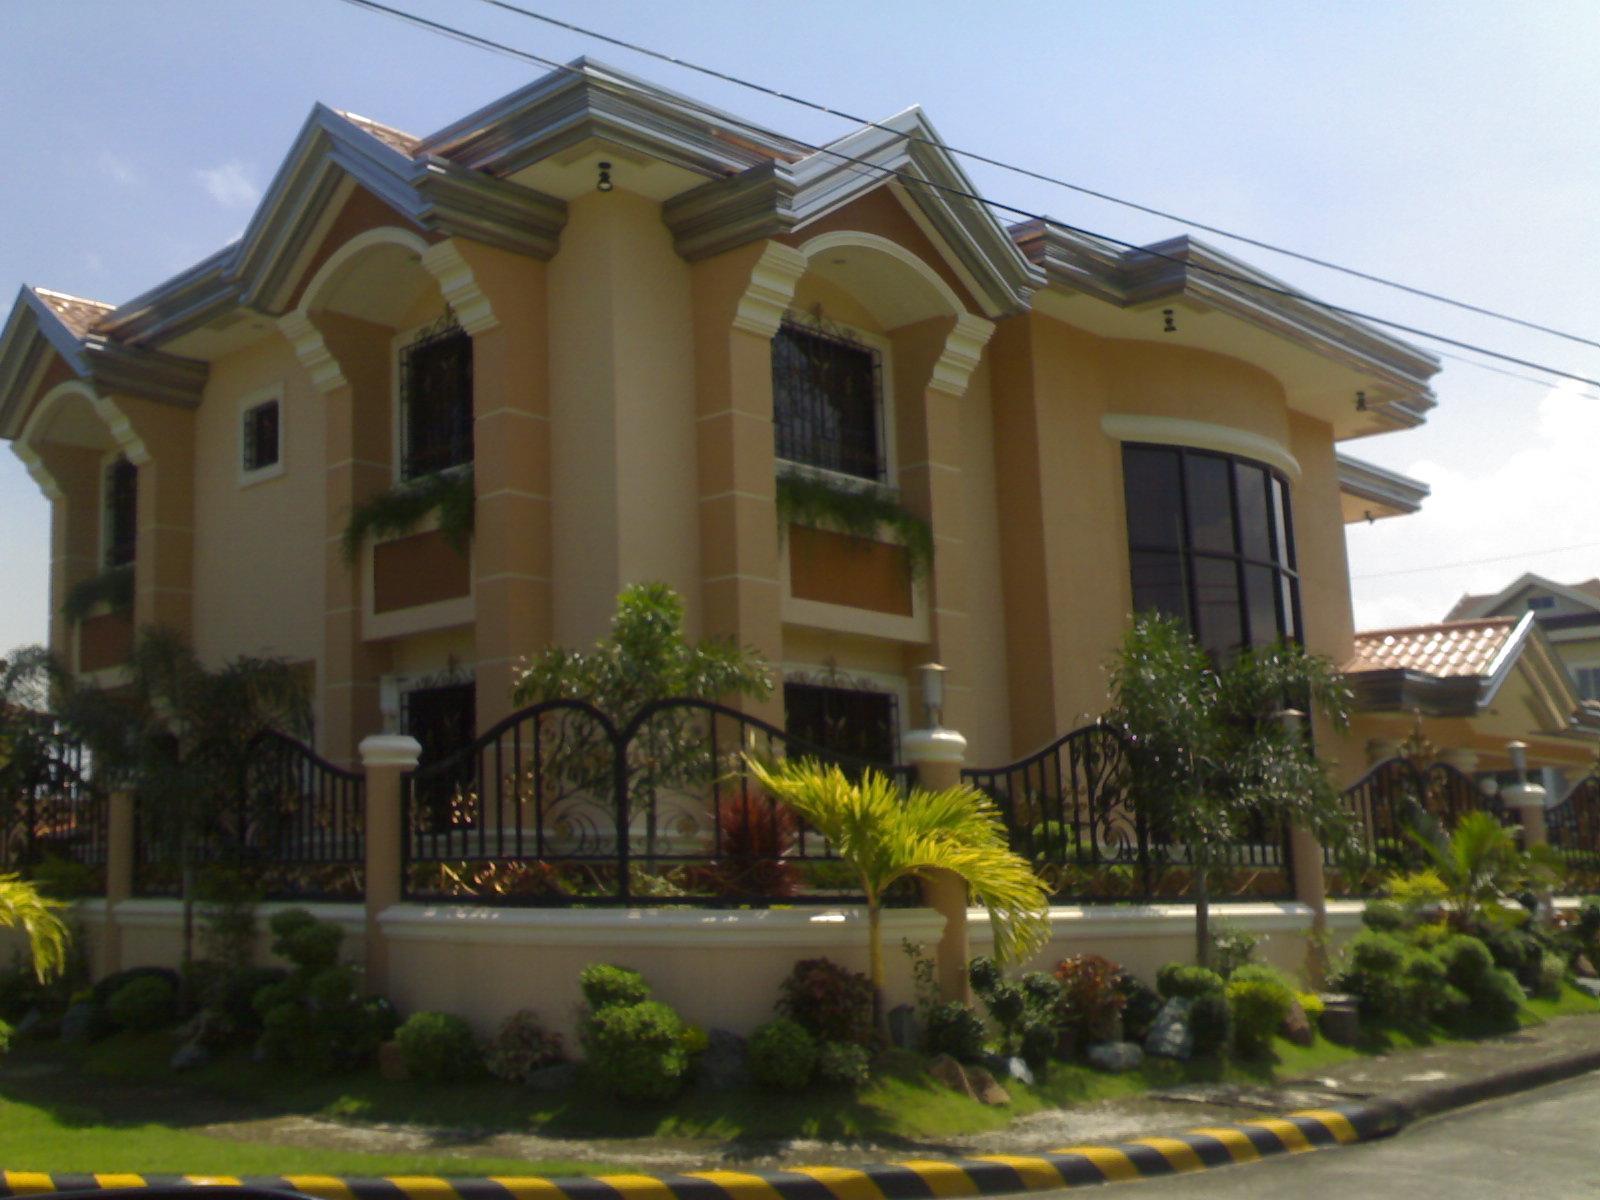 Roofing Amp Window Design Gharexpert